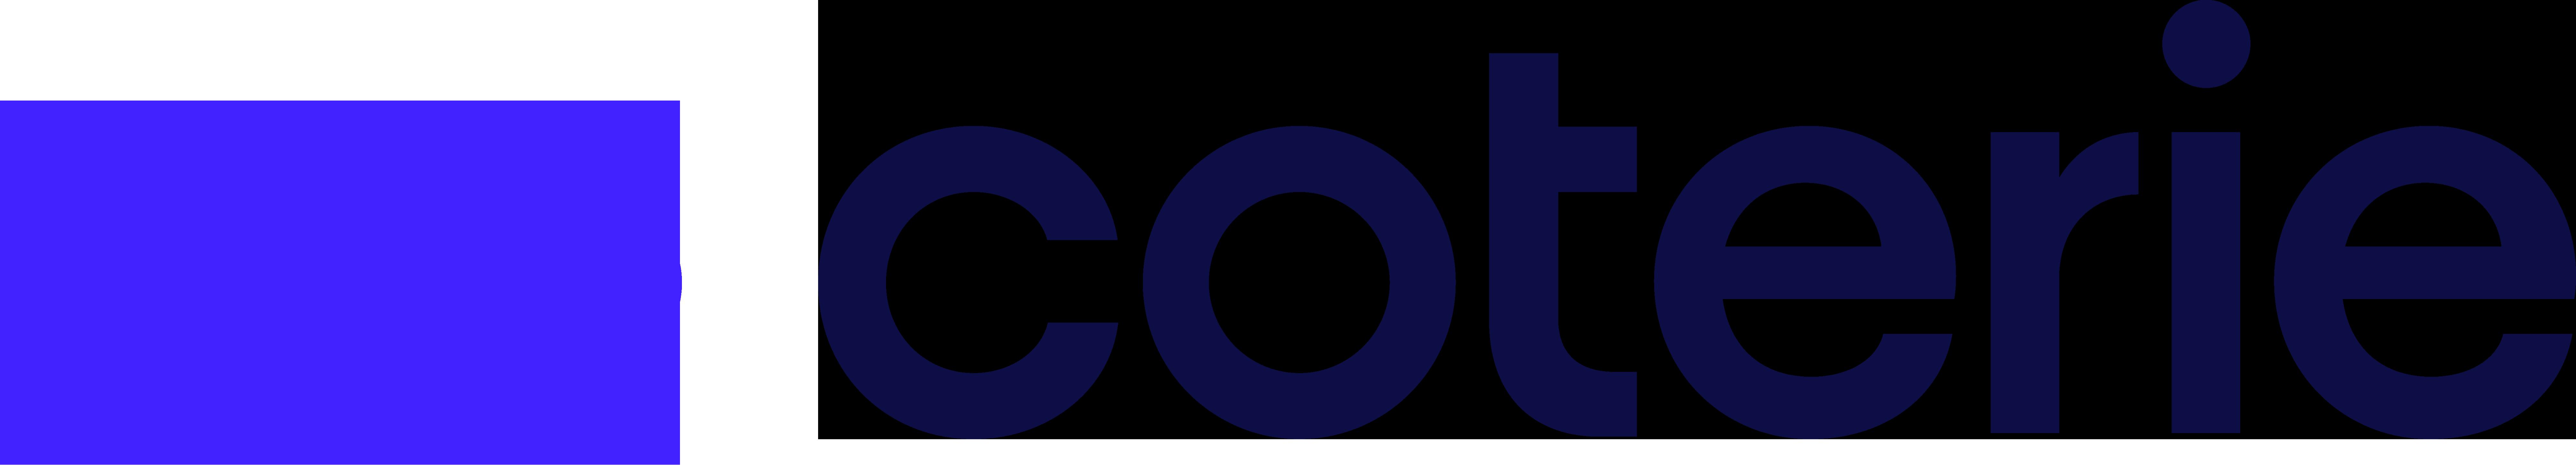 Coterie Insurance